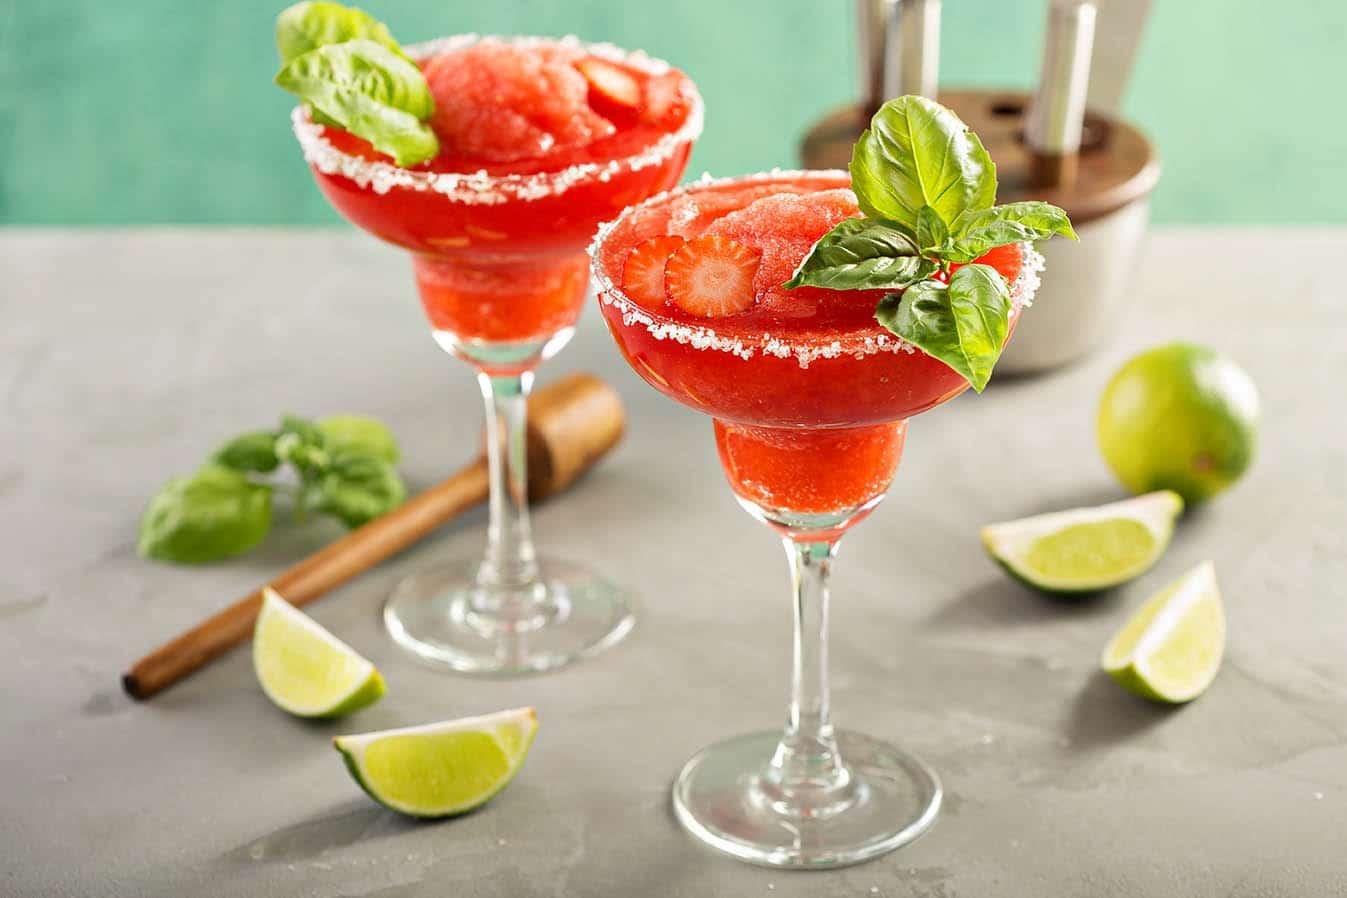 The Perfect Strawberry Basil Margarita Recipe via @mermaidsandmojitos